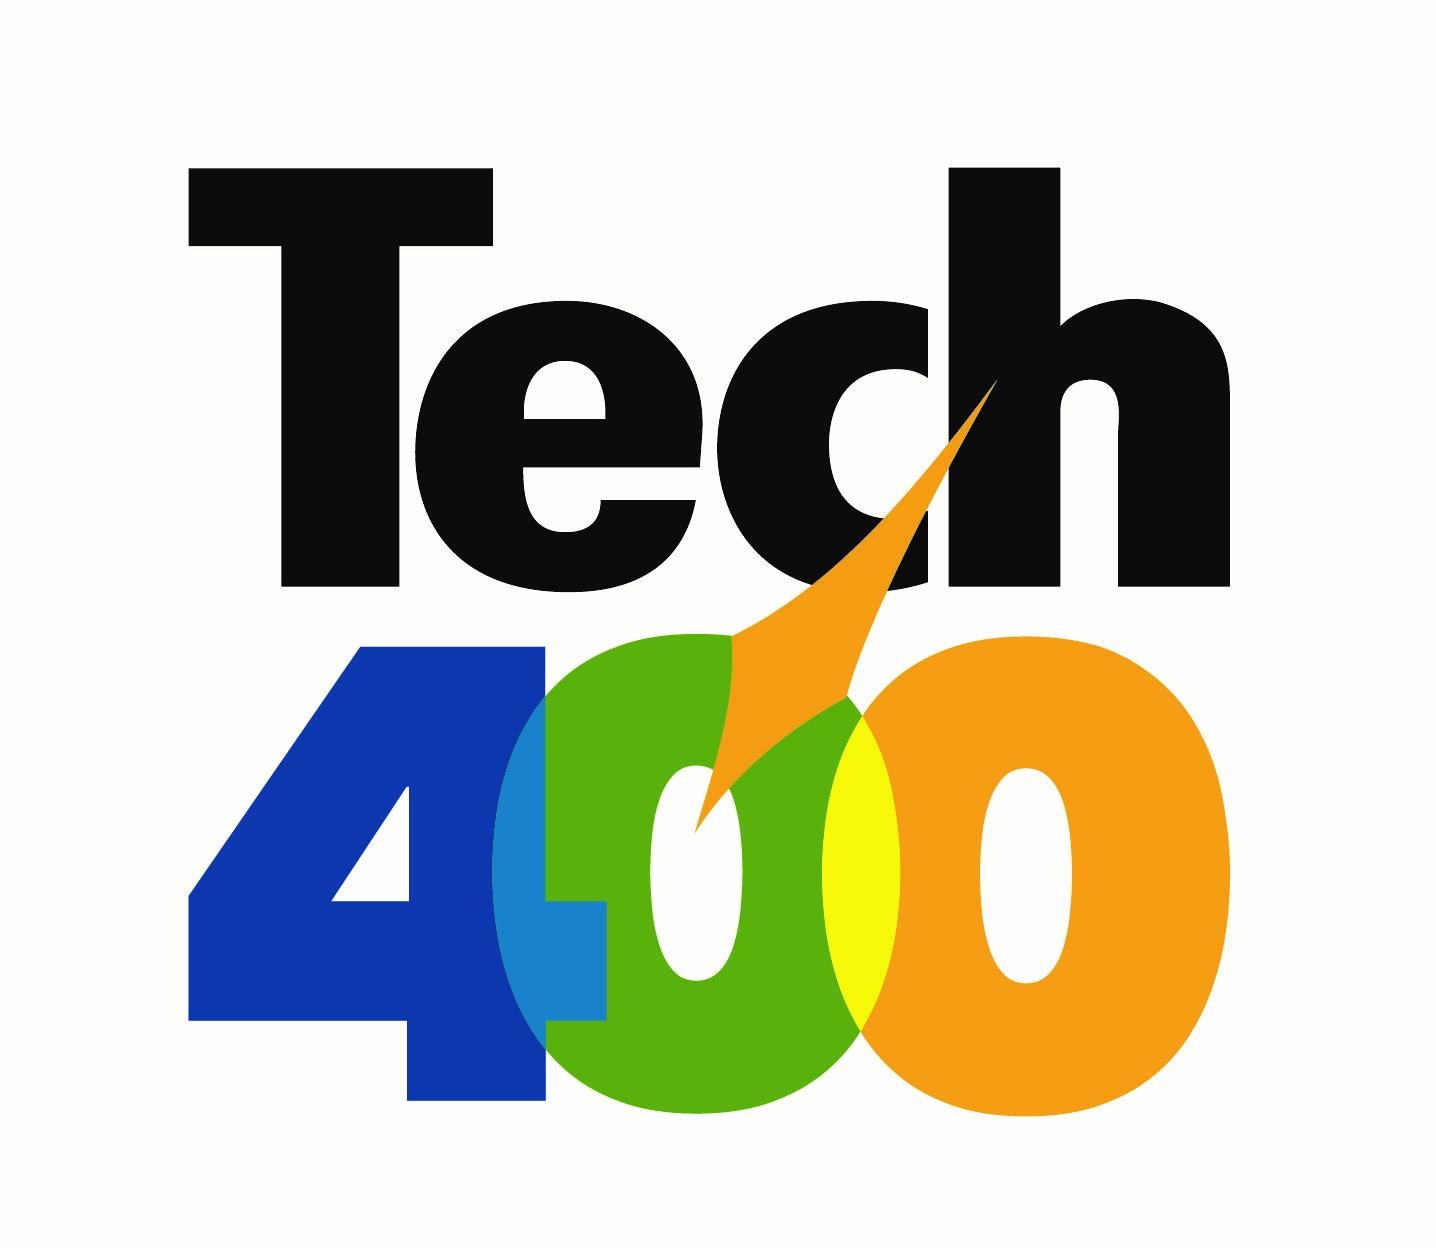 Alpharetta Ga Mail: Alpharetta, Georgia: The Technology City Of